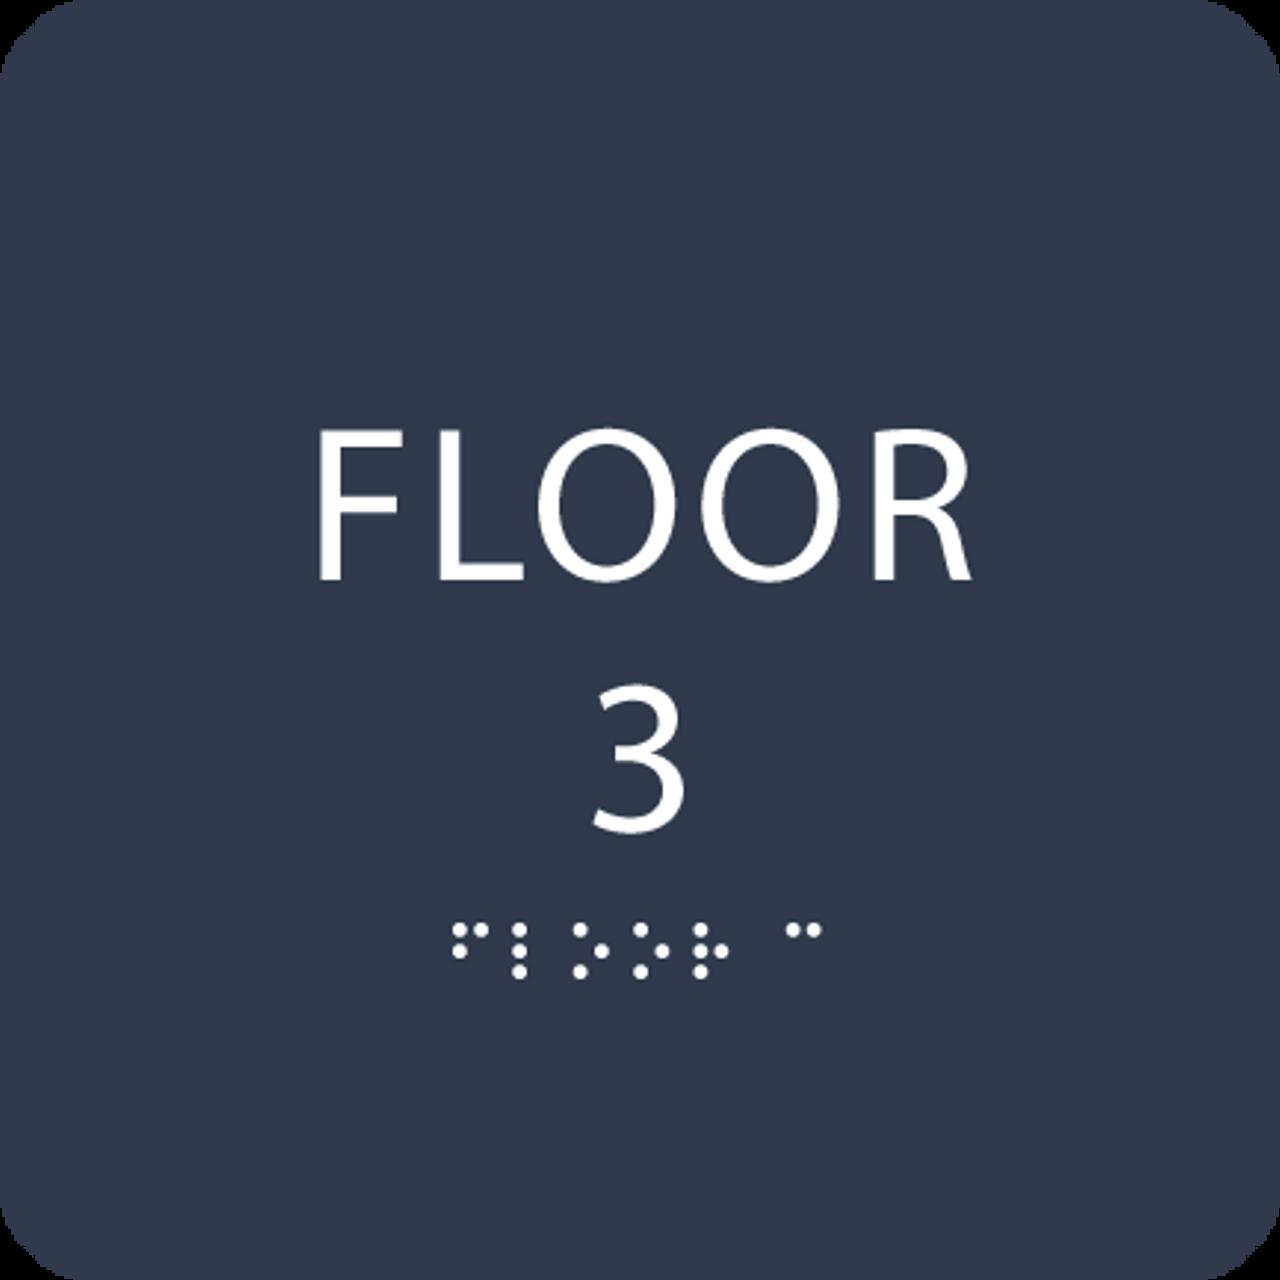 Navy Floor 3 Identification Sign